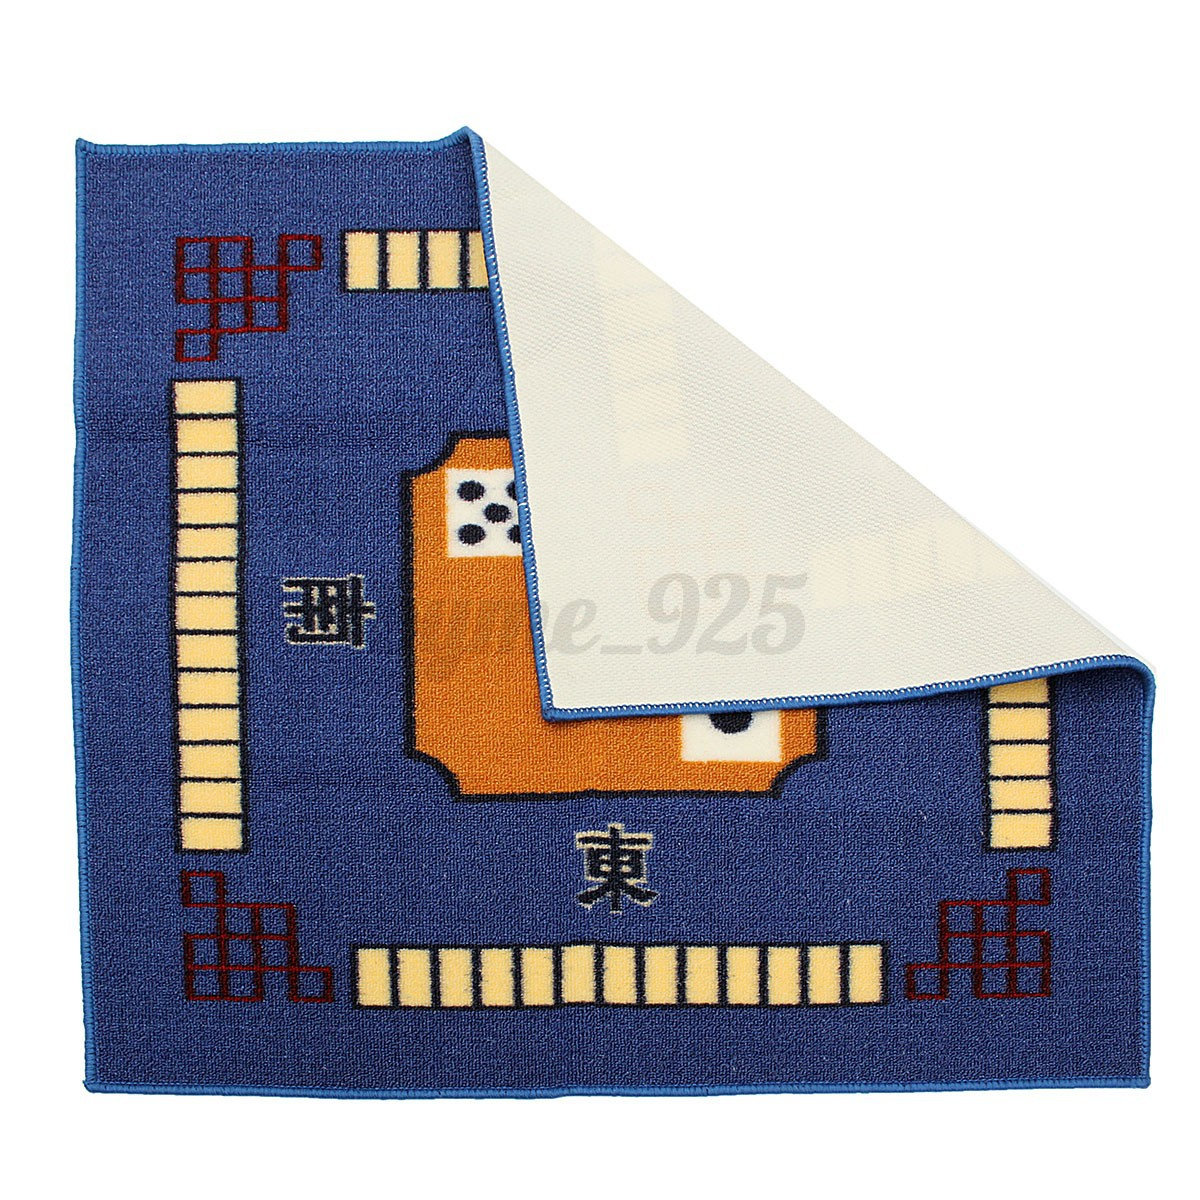 Mahjong Table Mat 78 x 78cm Mahjong / Card / Game Table Cover Mute Jacquard Tablecloth 3 ...